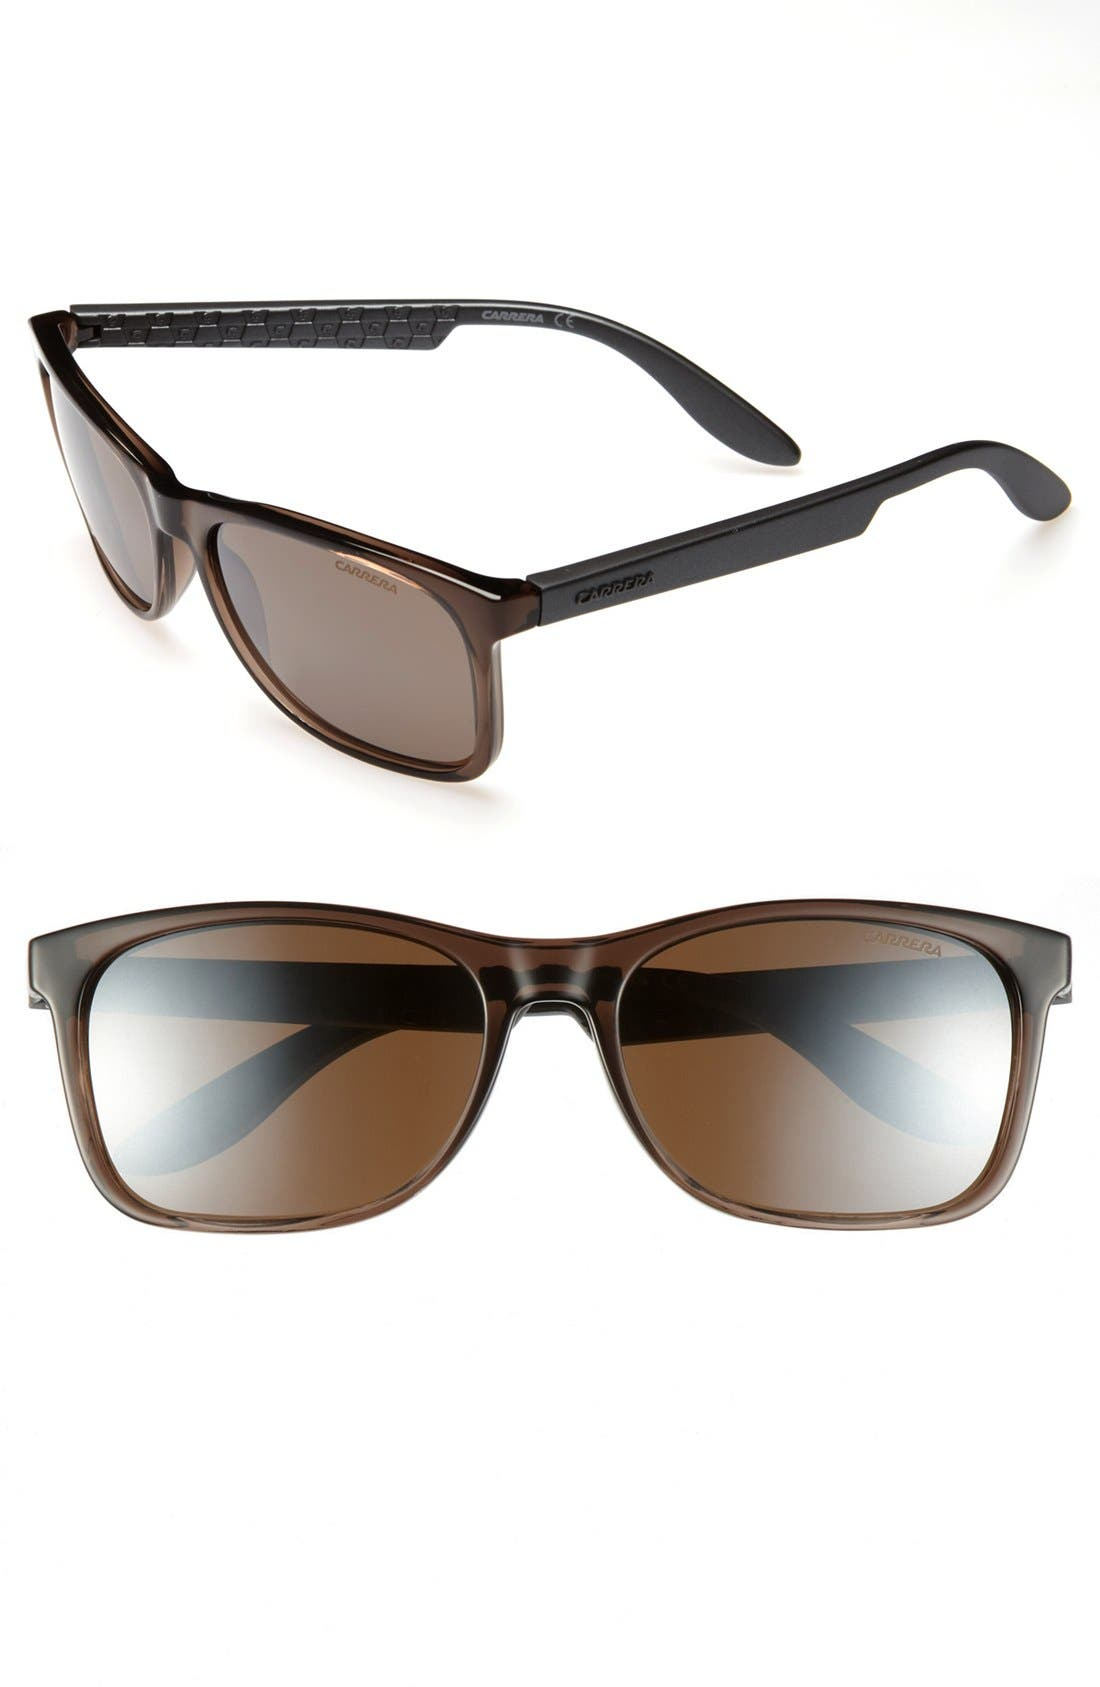 Main Image - Carrera Eyewear 56mm Sunglasses